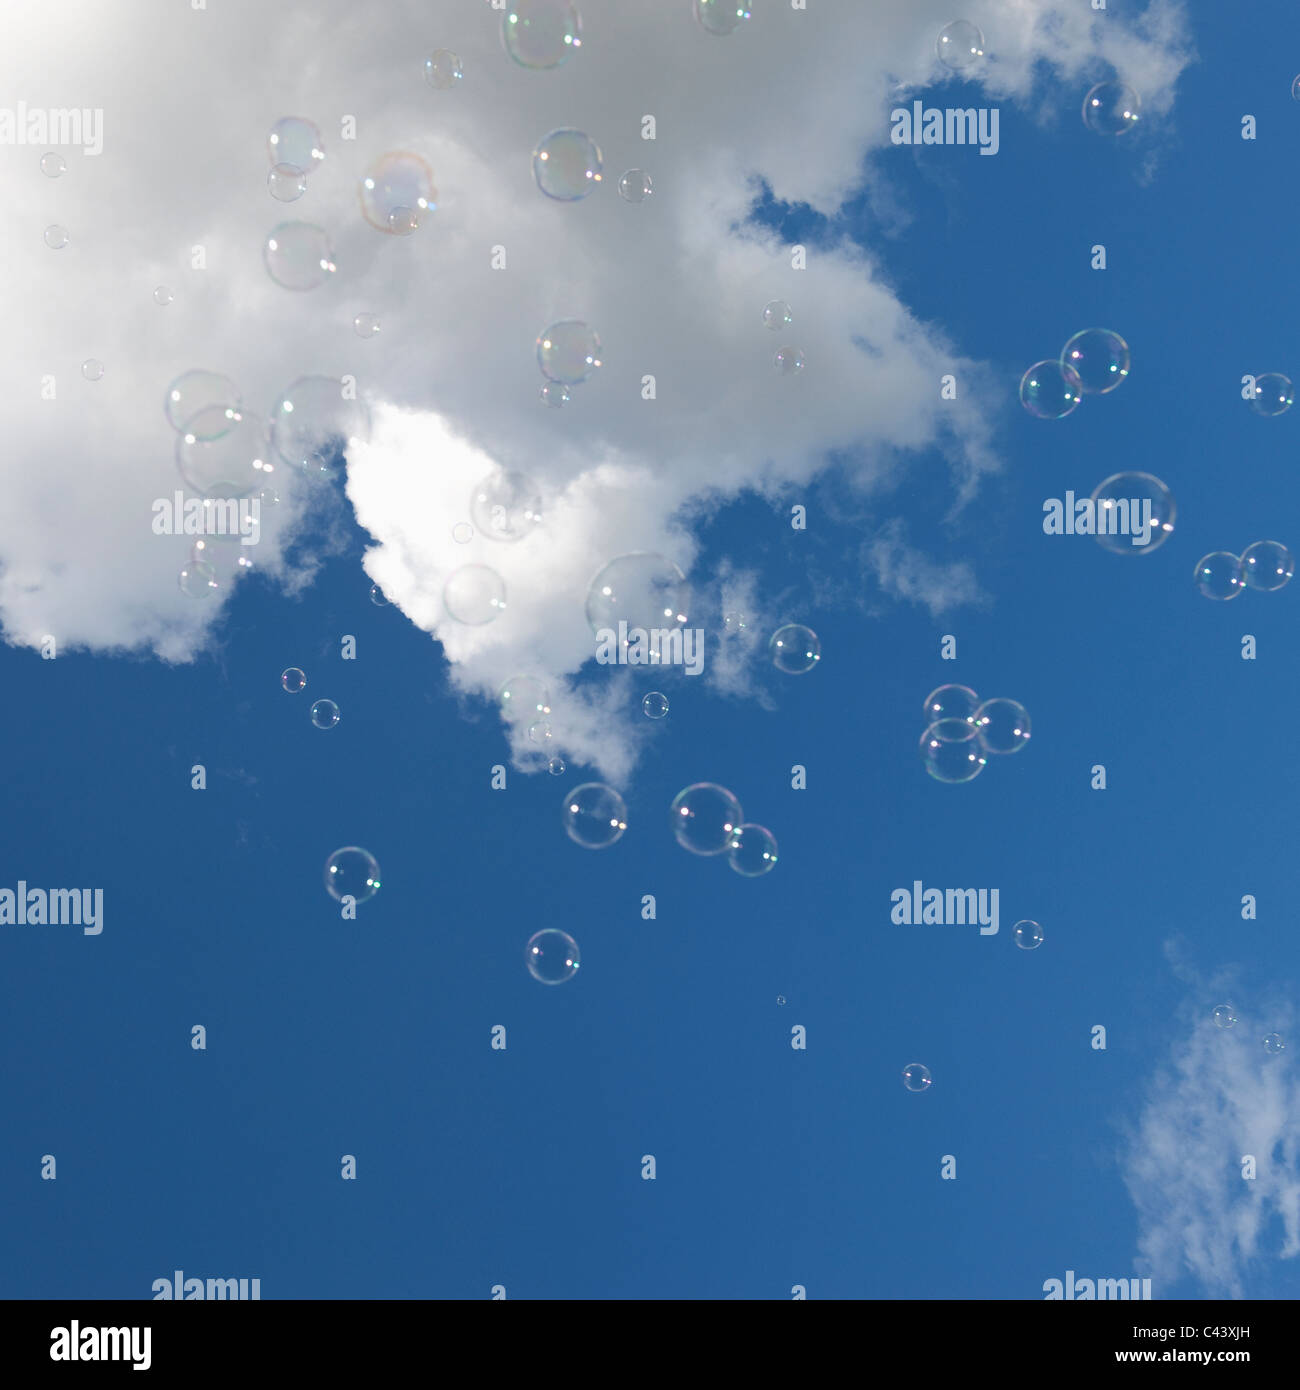 Burbujas contra un cielo azul con nubes blancas. Imagen De Stock